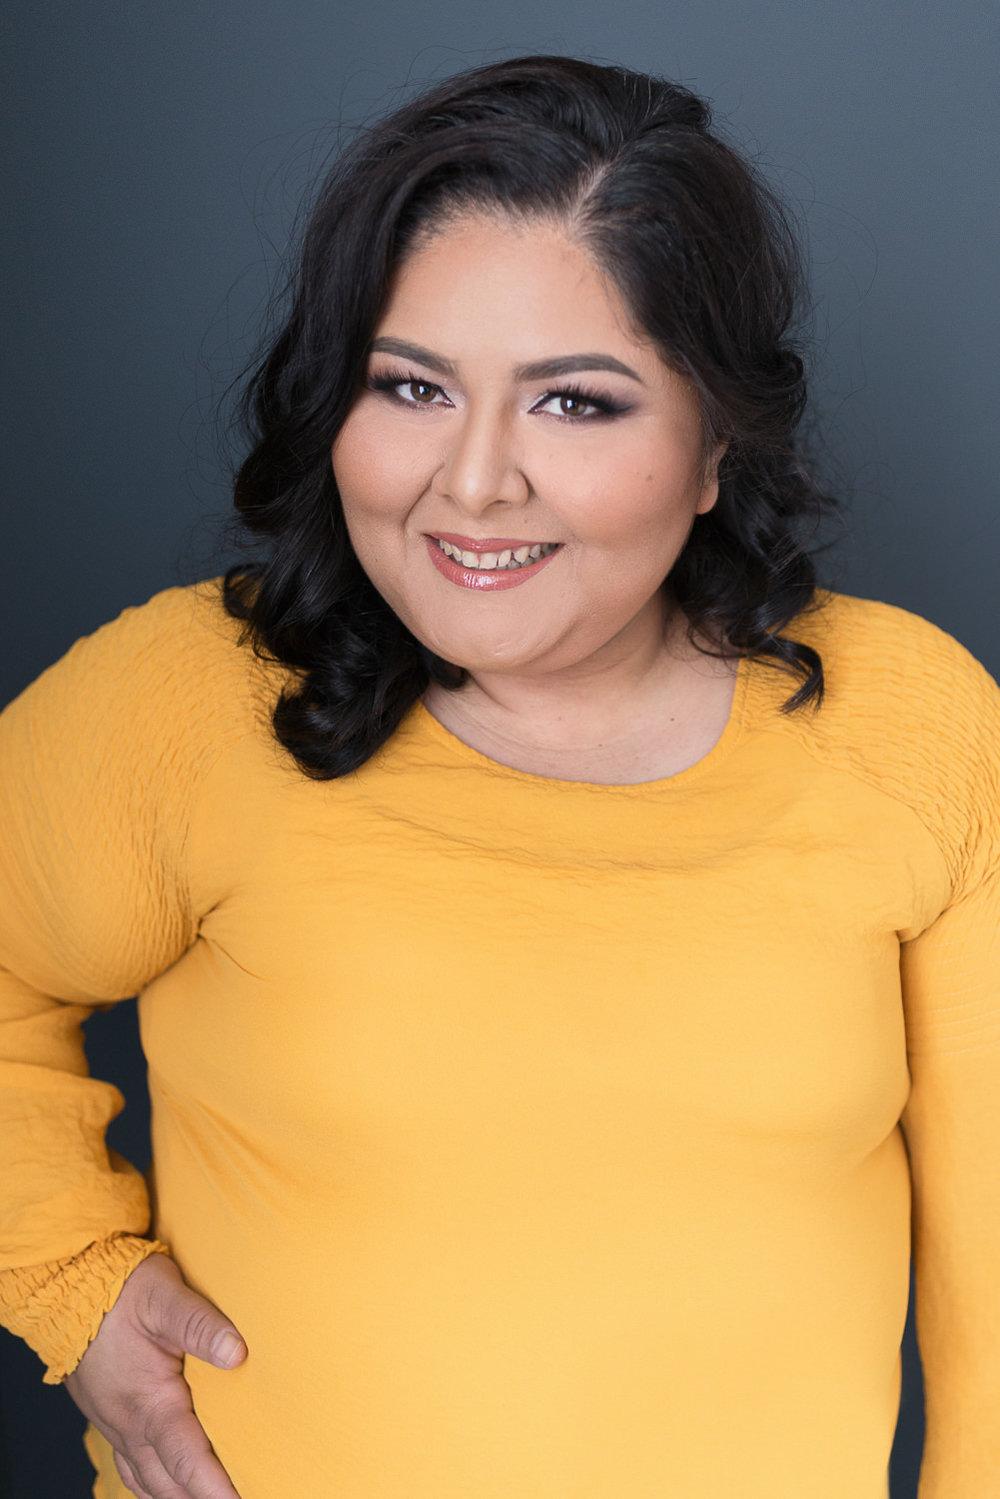 Melissa-Alcantar-Fotografia-Sesion-fotos-mexicali-retrato-Ana-Lo